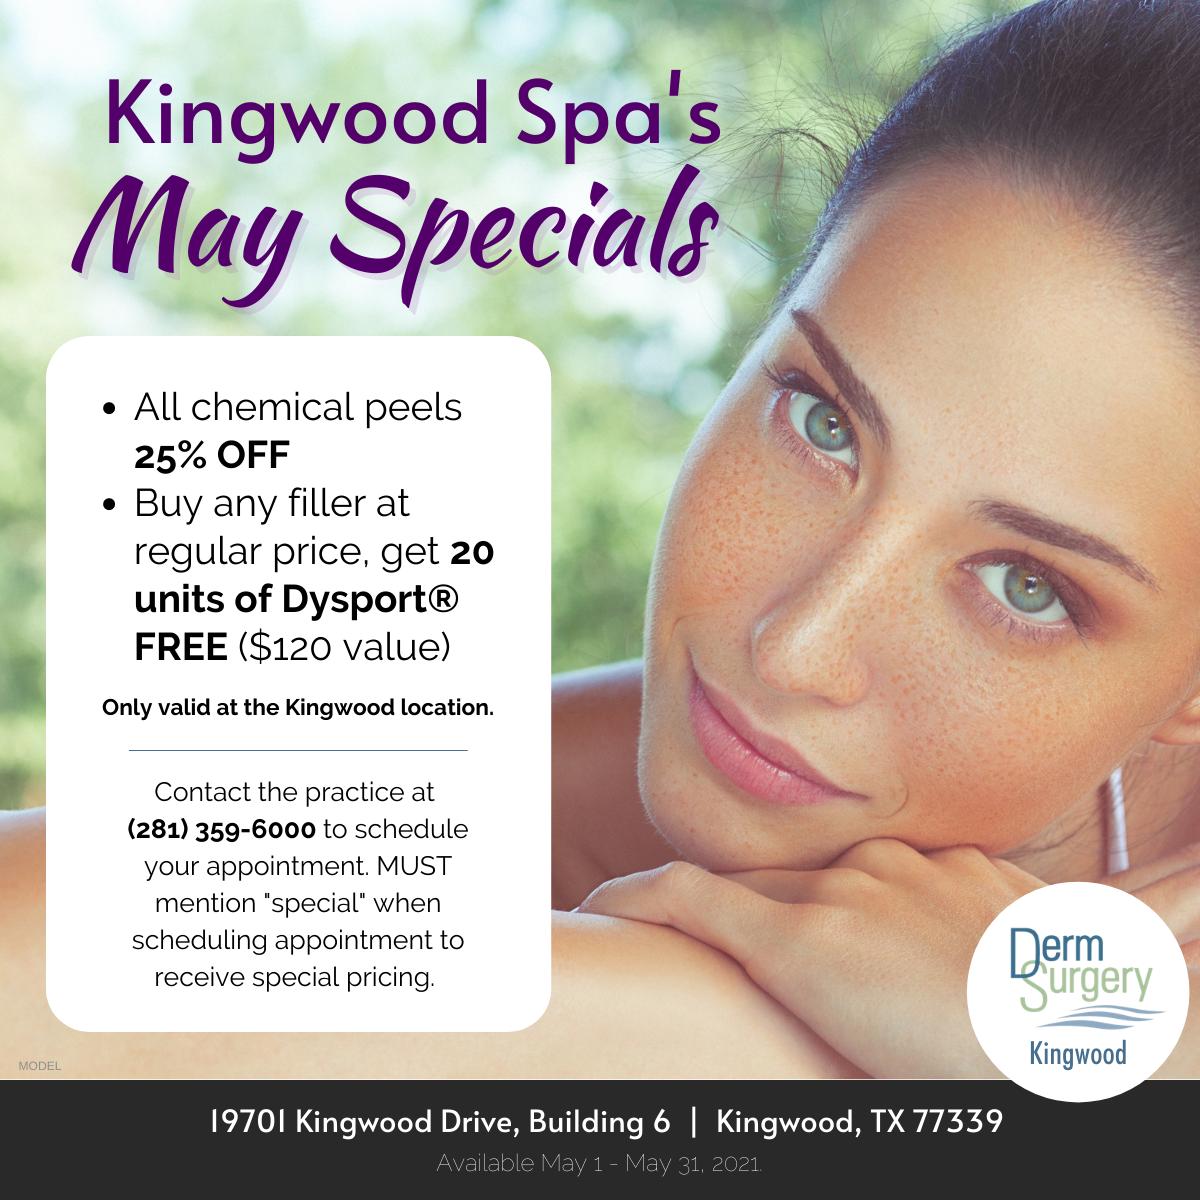 Kingwood Spa's May Specials